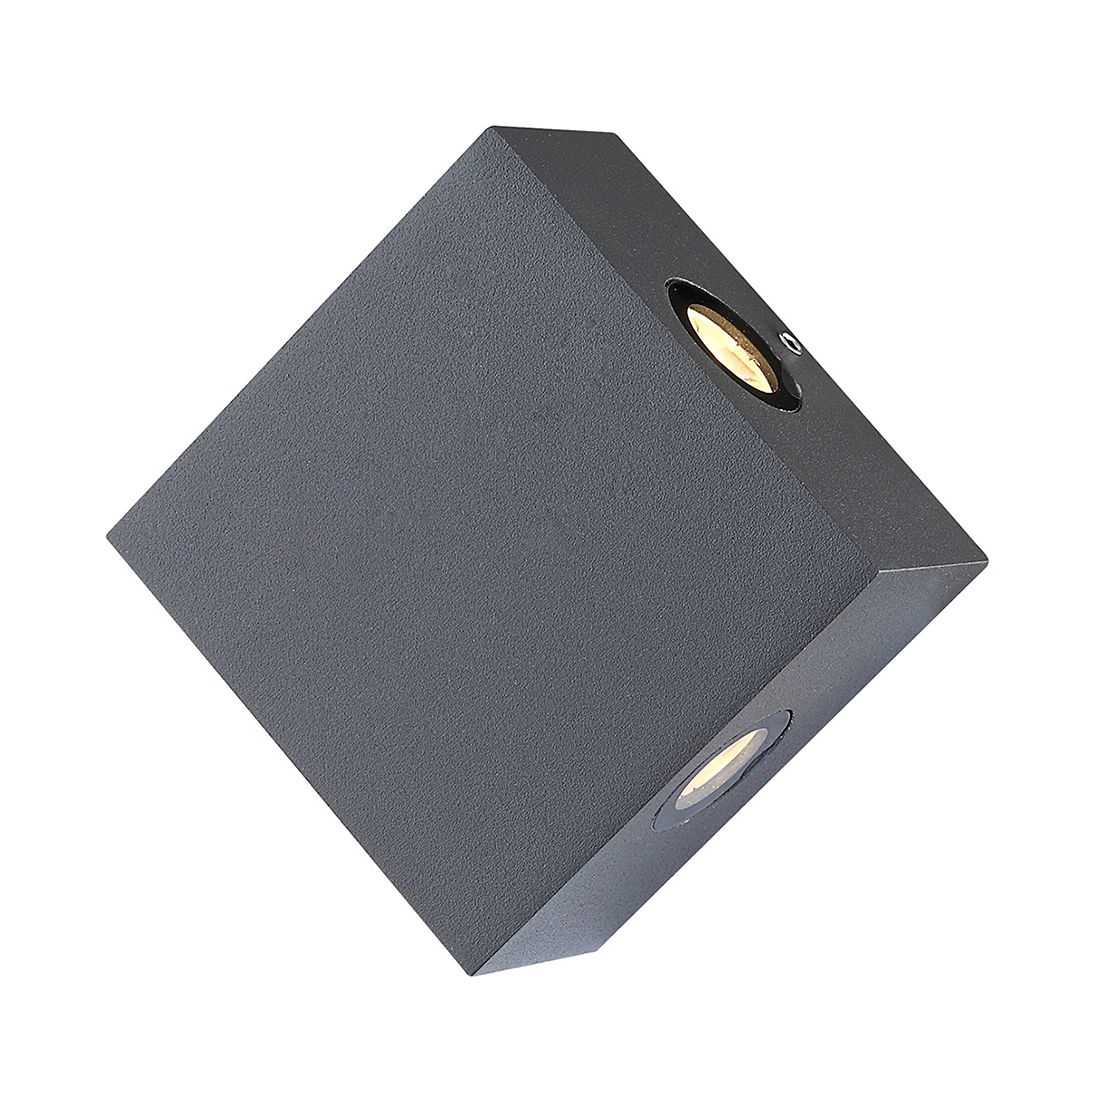 Außenleuchte Isono II ● Grau ● Aluminium Druckguß- Globo Lighting A+